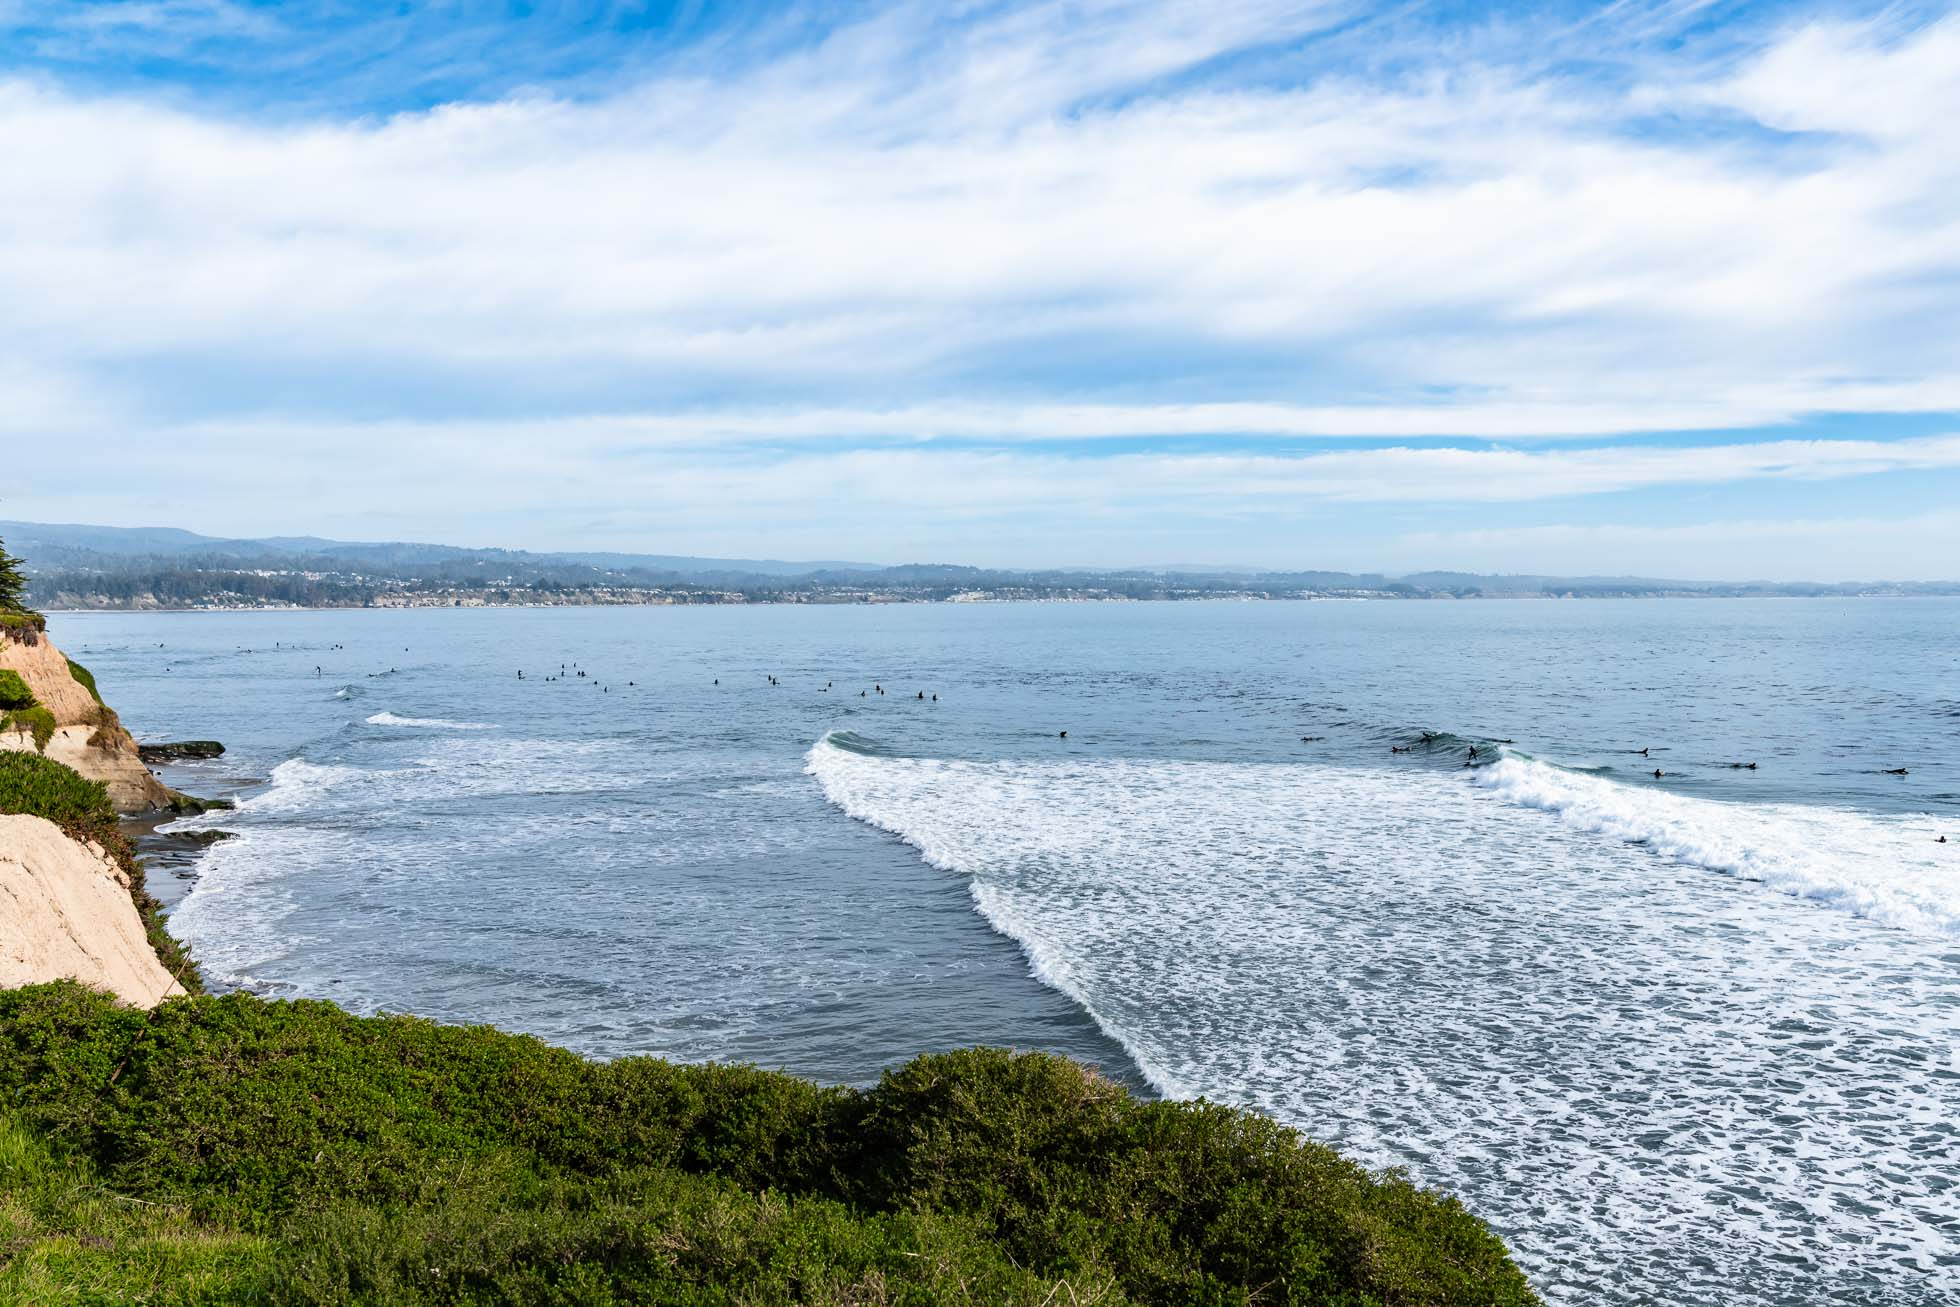 santa cruz, surfing shoreline